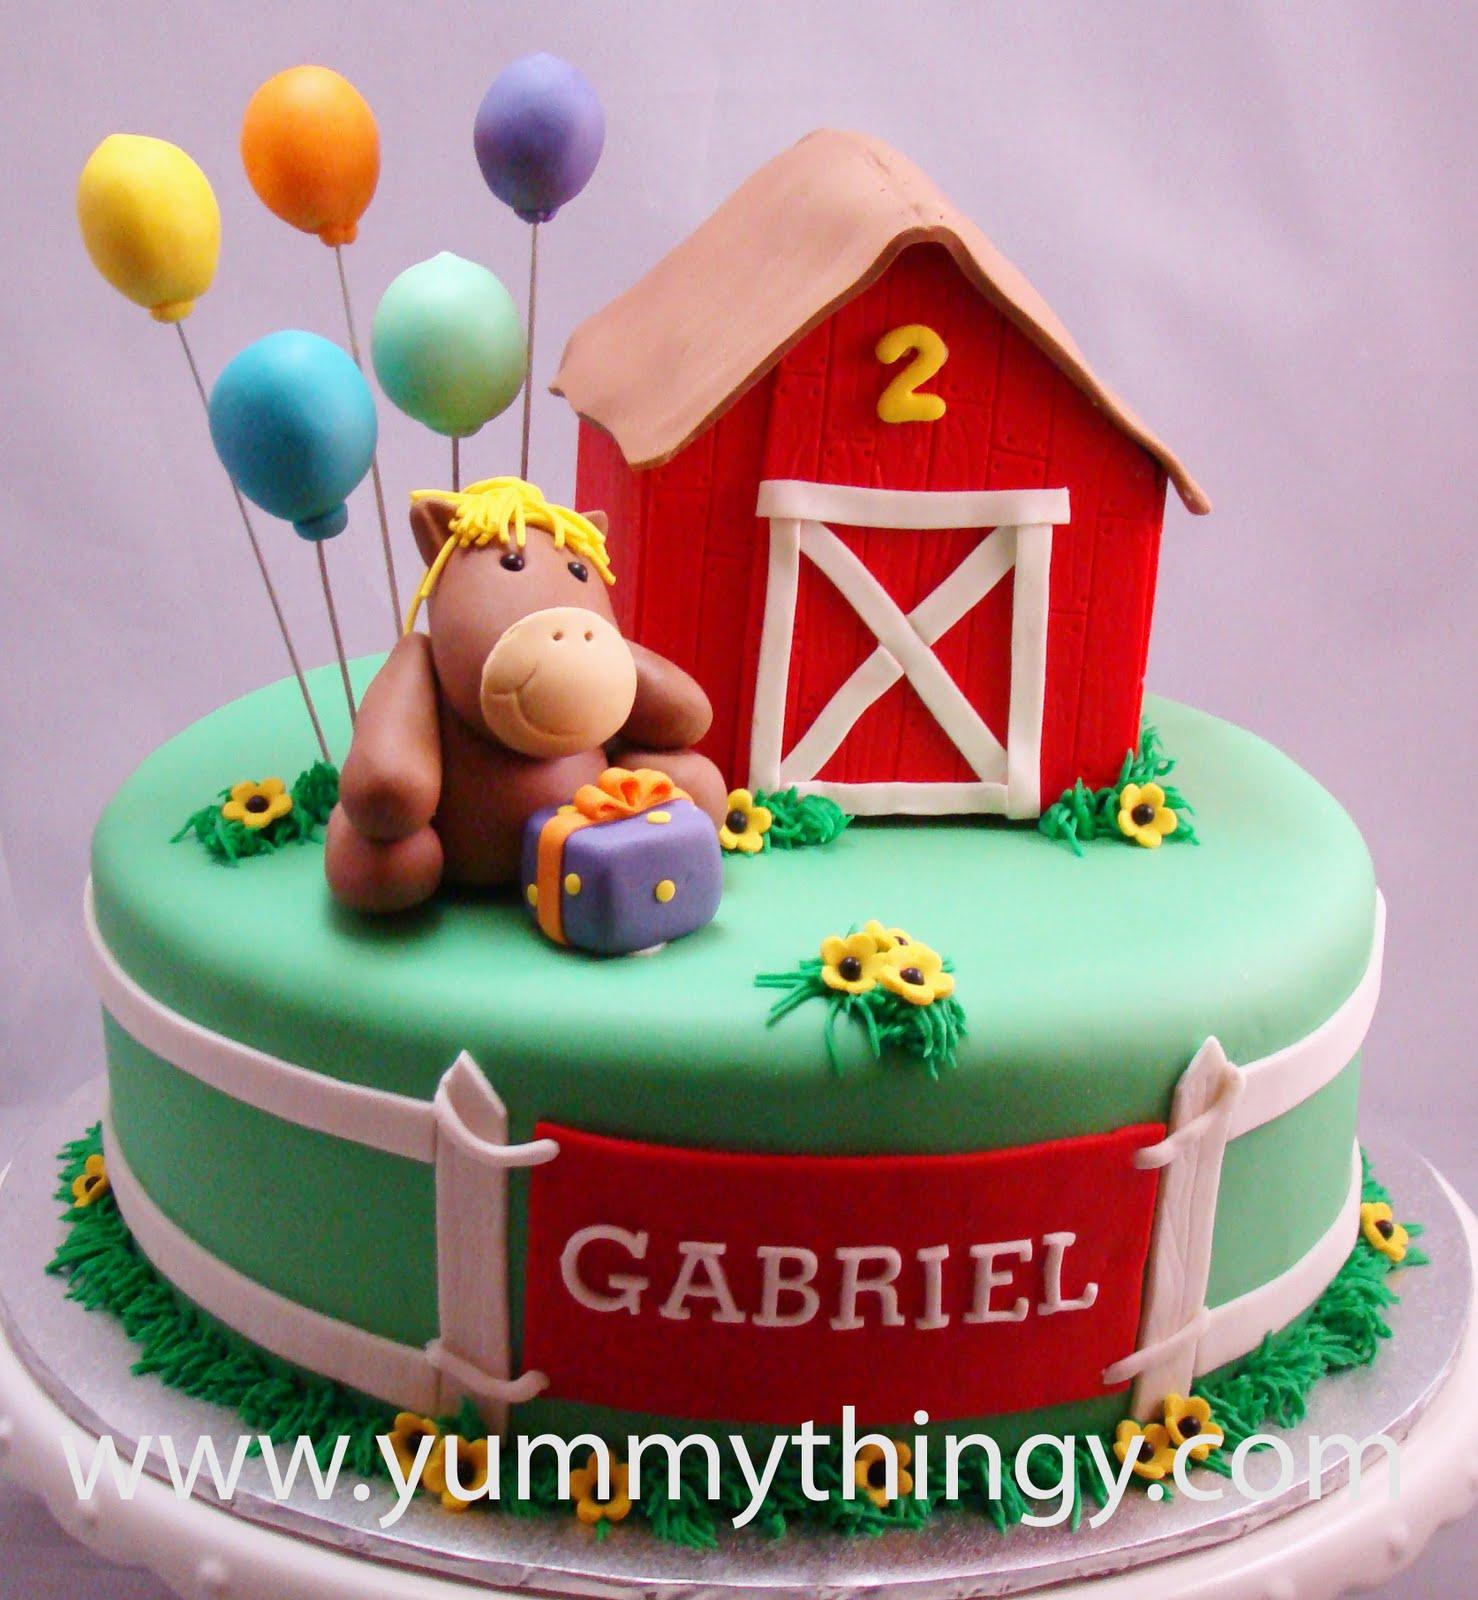 Yummy Thingy Farm Theme Cake